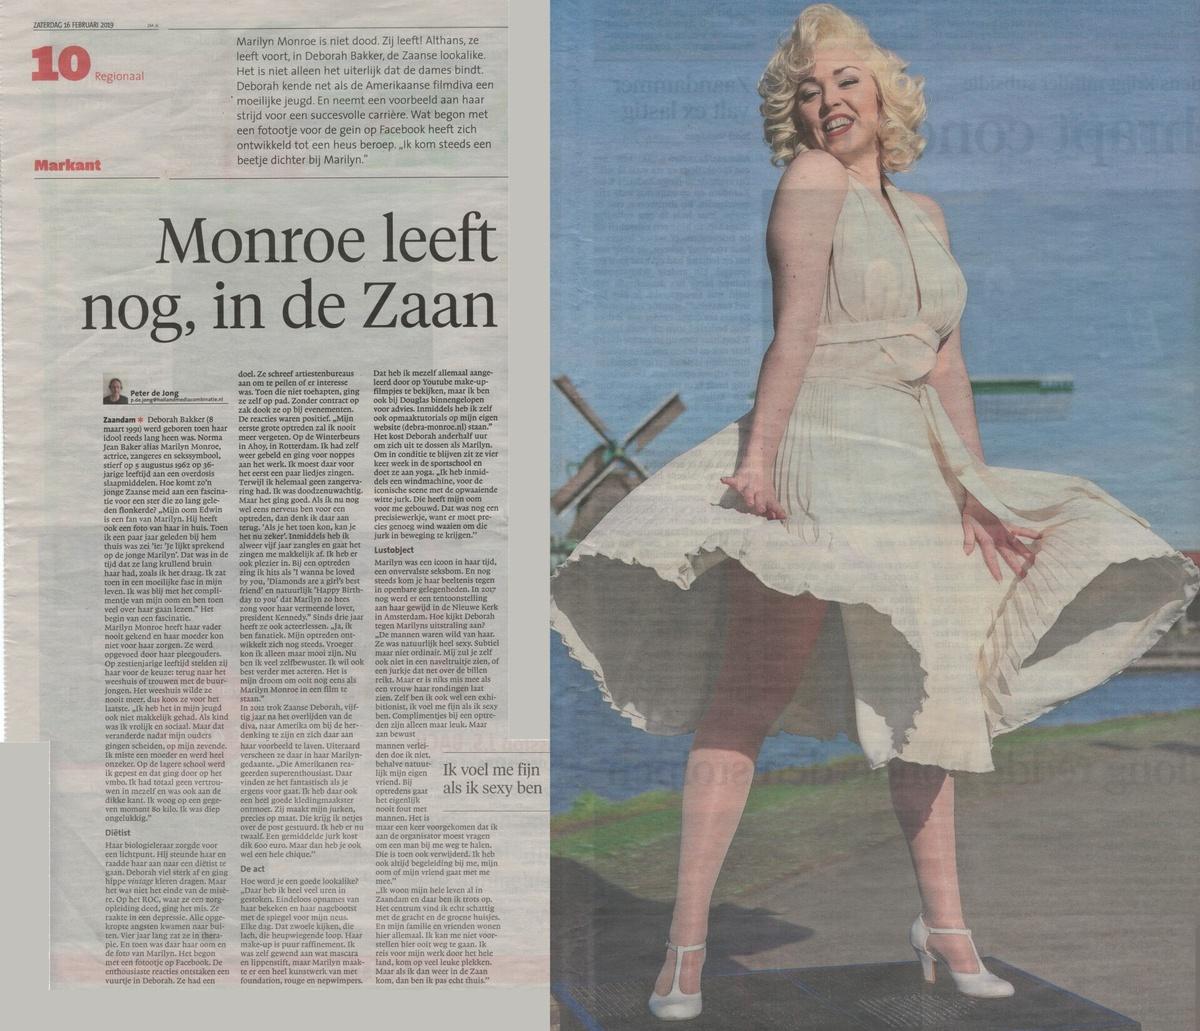 Debra Monroe, Marilyn Monroe lookalike, Marilyn Monroe look alike, Marilyn Monroe lookalike boeken, Marilyn Monroe